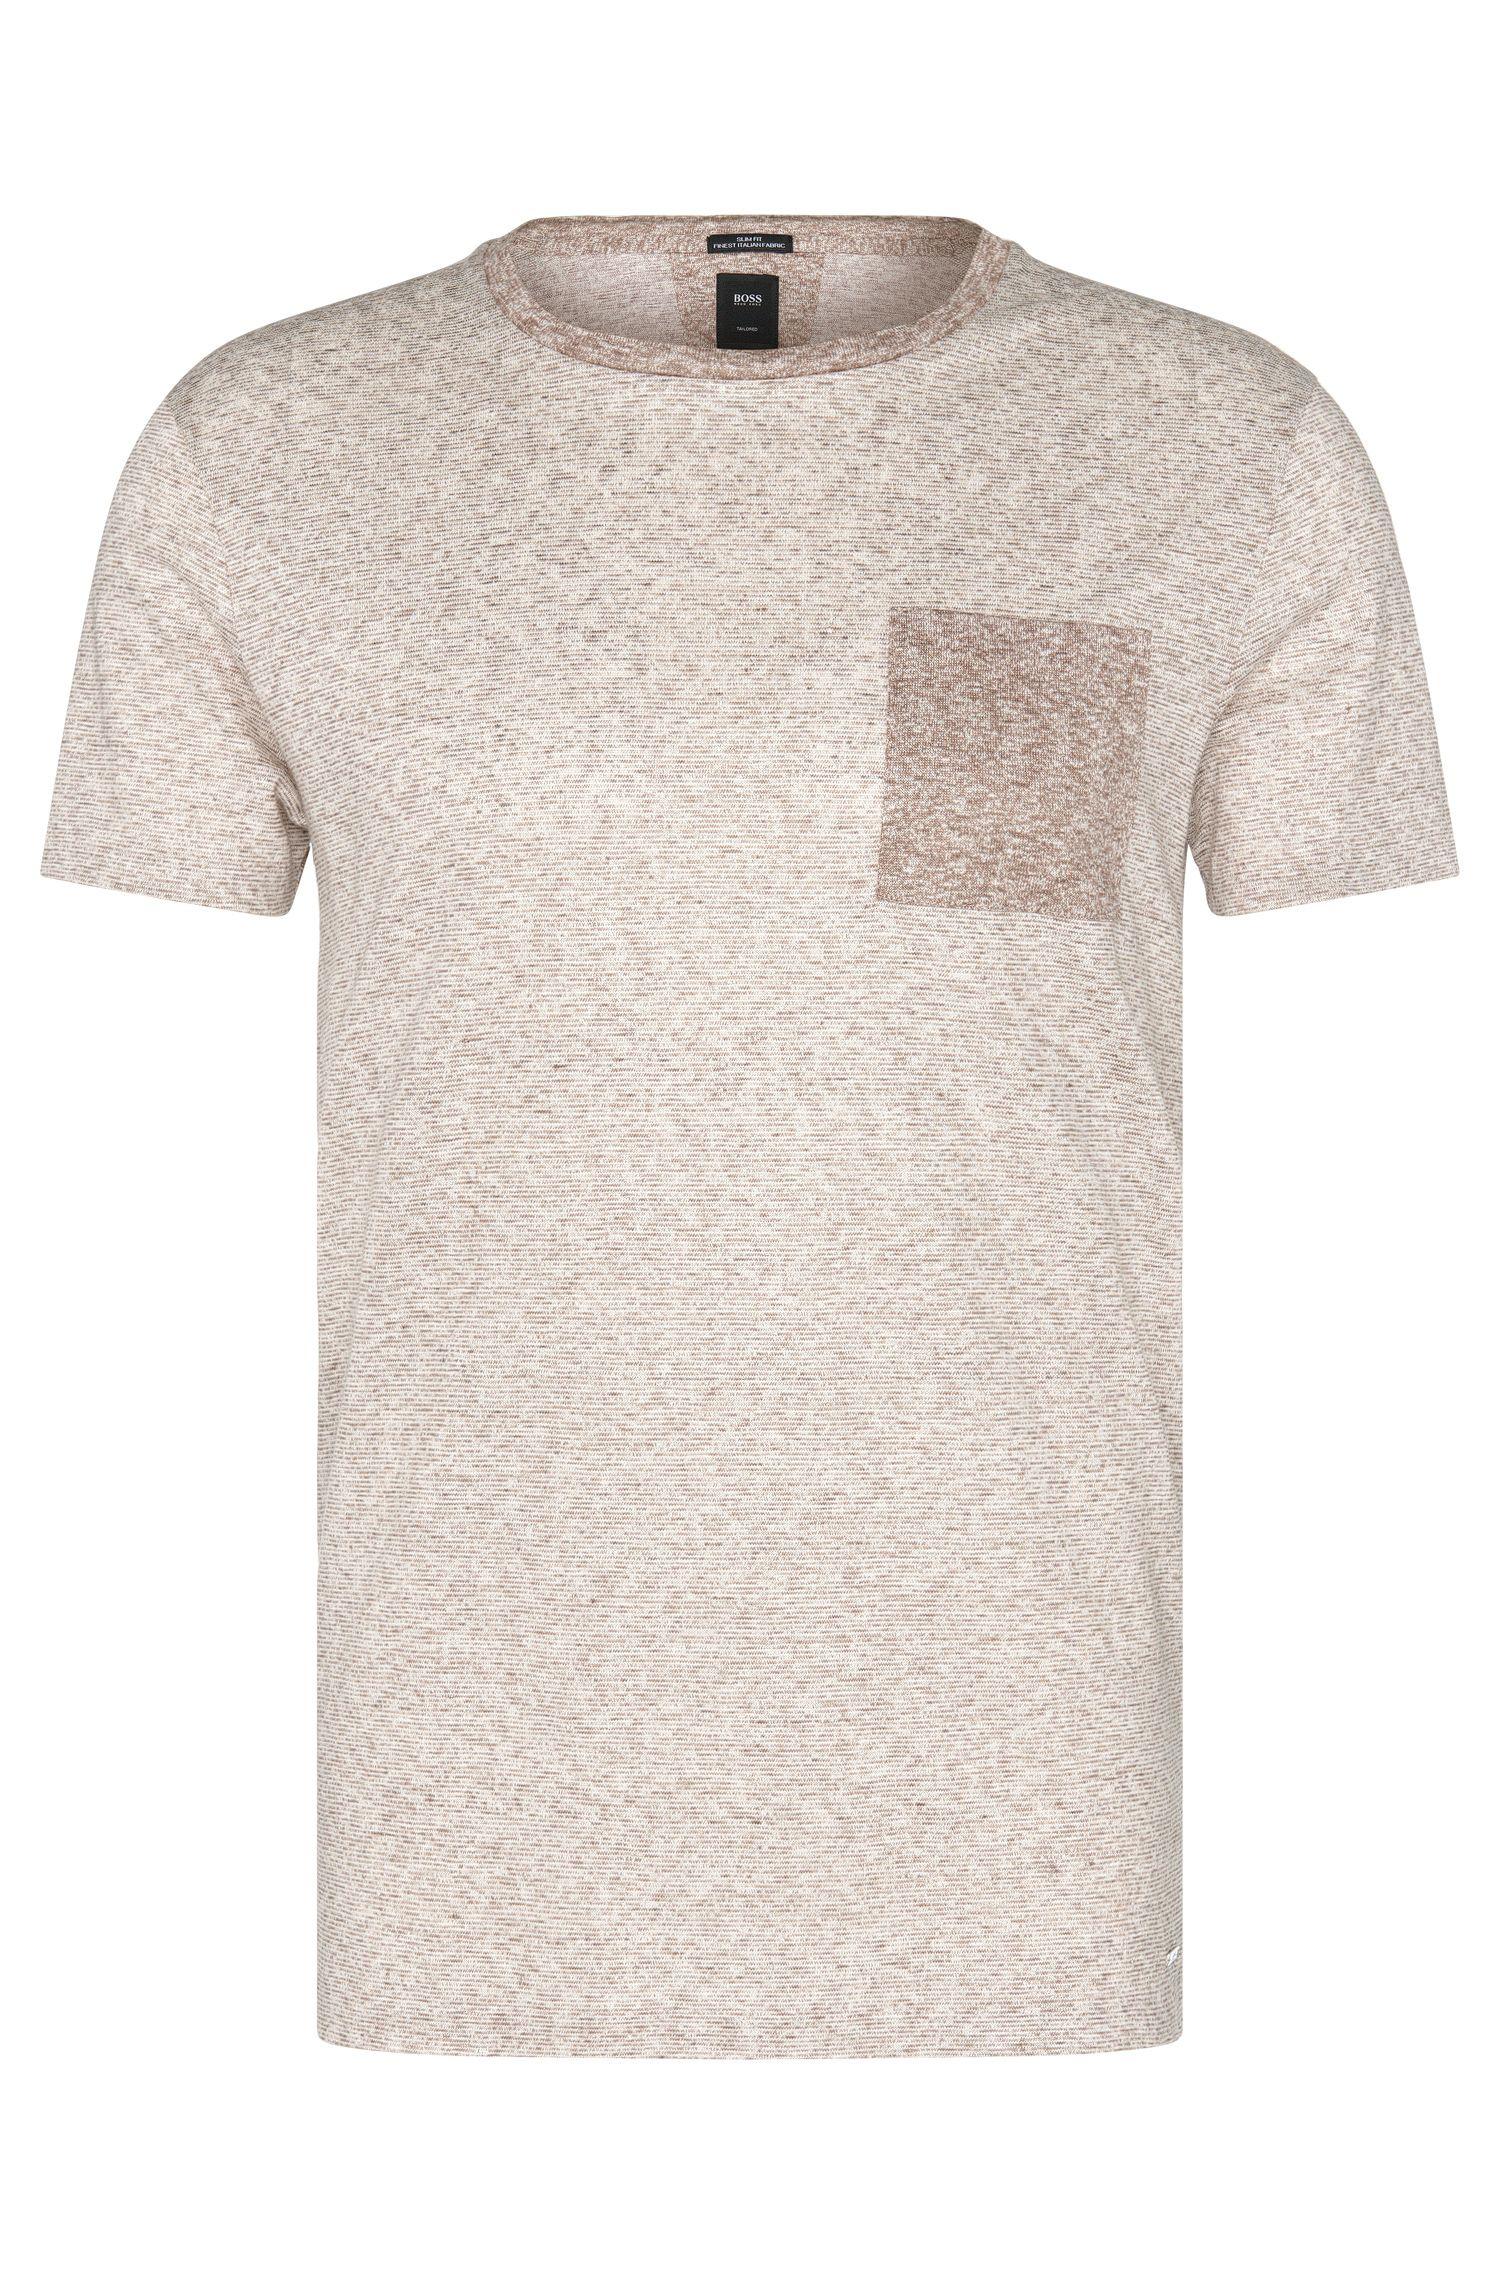 Camiseta estampada slim fit Tailored en lino: 'T-Tribel 24'